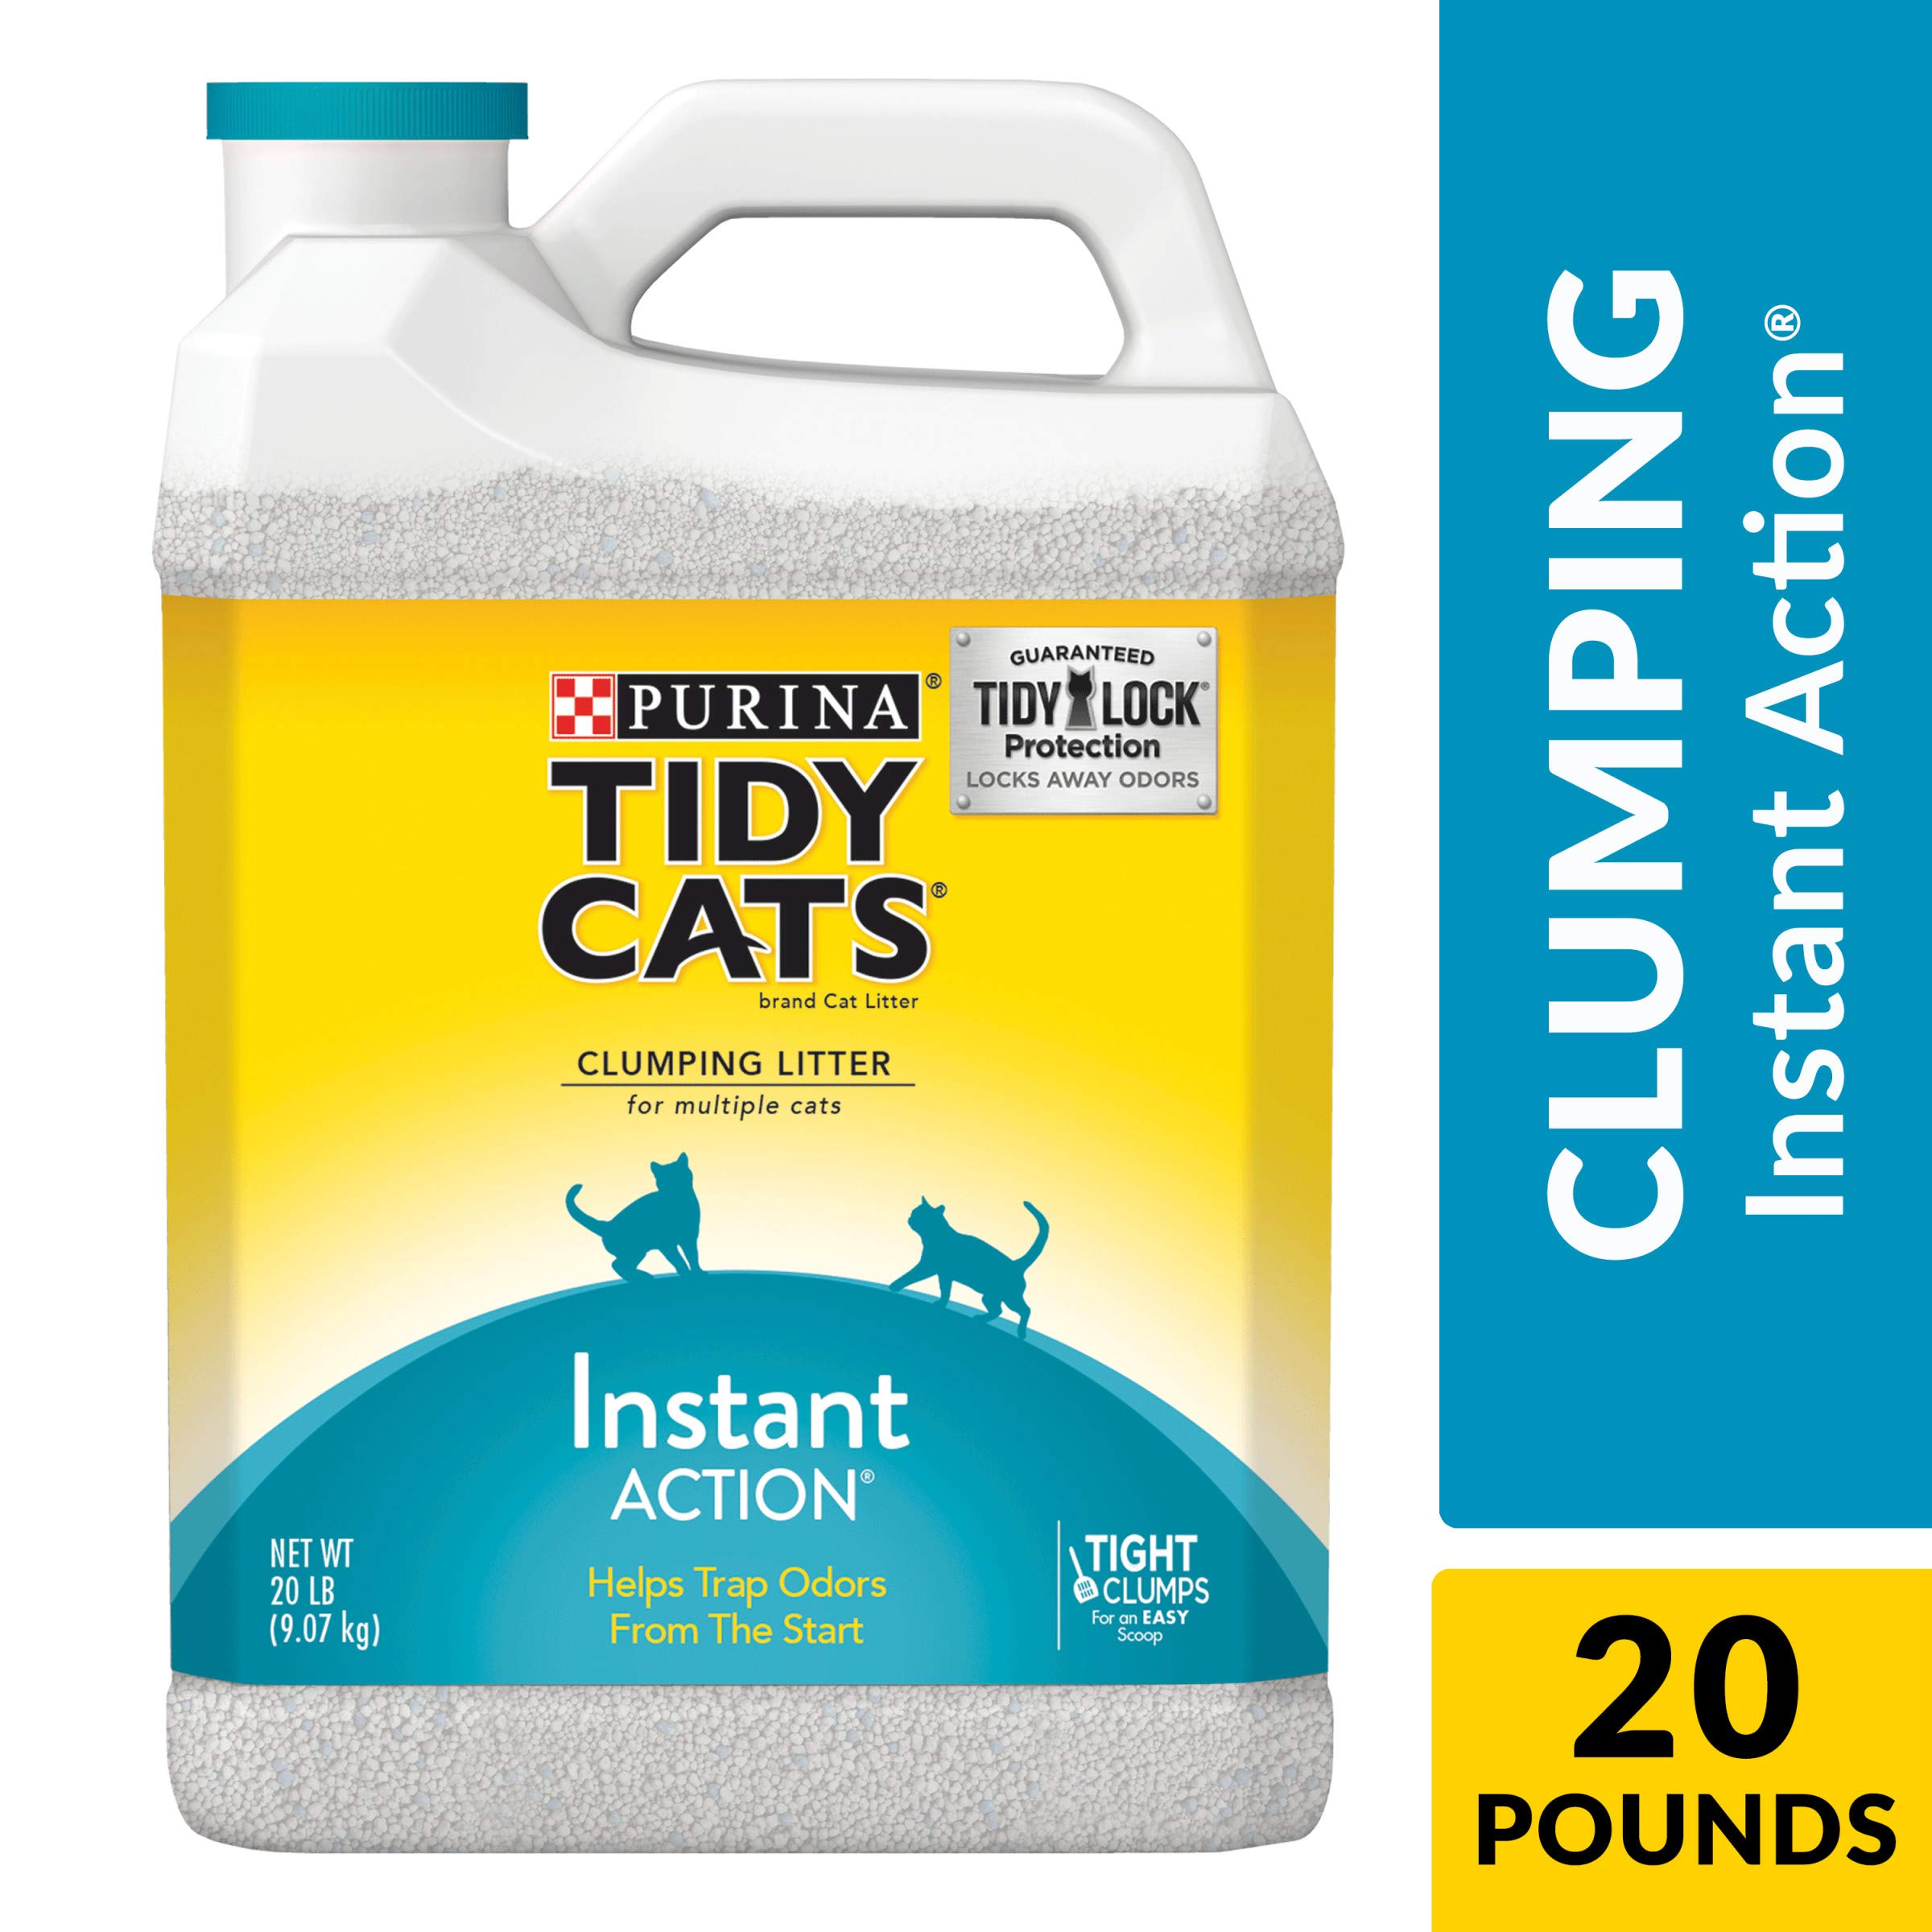 Purina Tidy Cats Clumping Cat Litter; Instant Action Multi Cat Litter - (2) 20 lb. Jugs